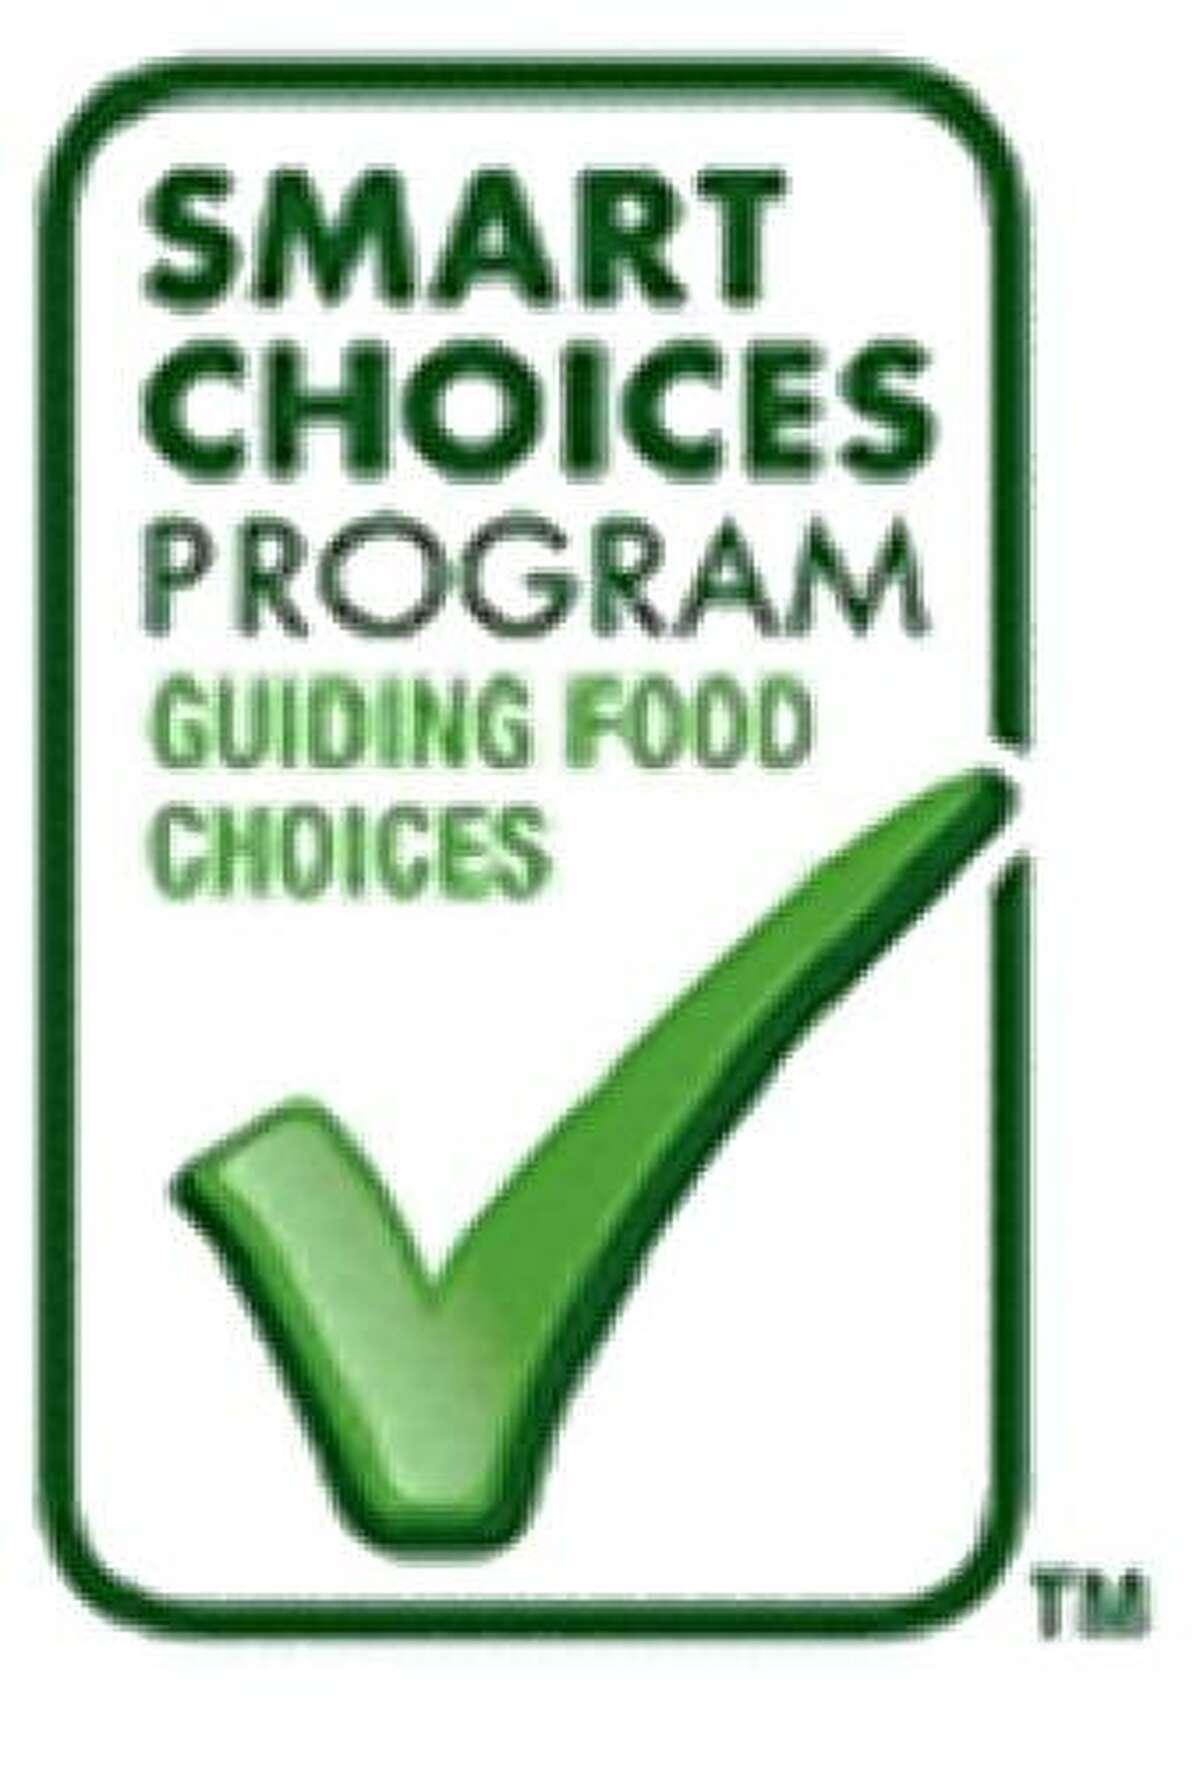 Pepsico's Smart Choices logo